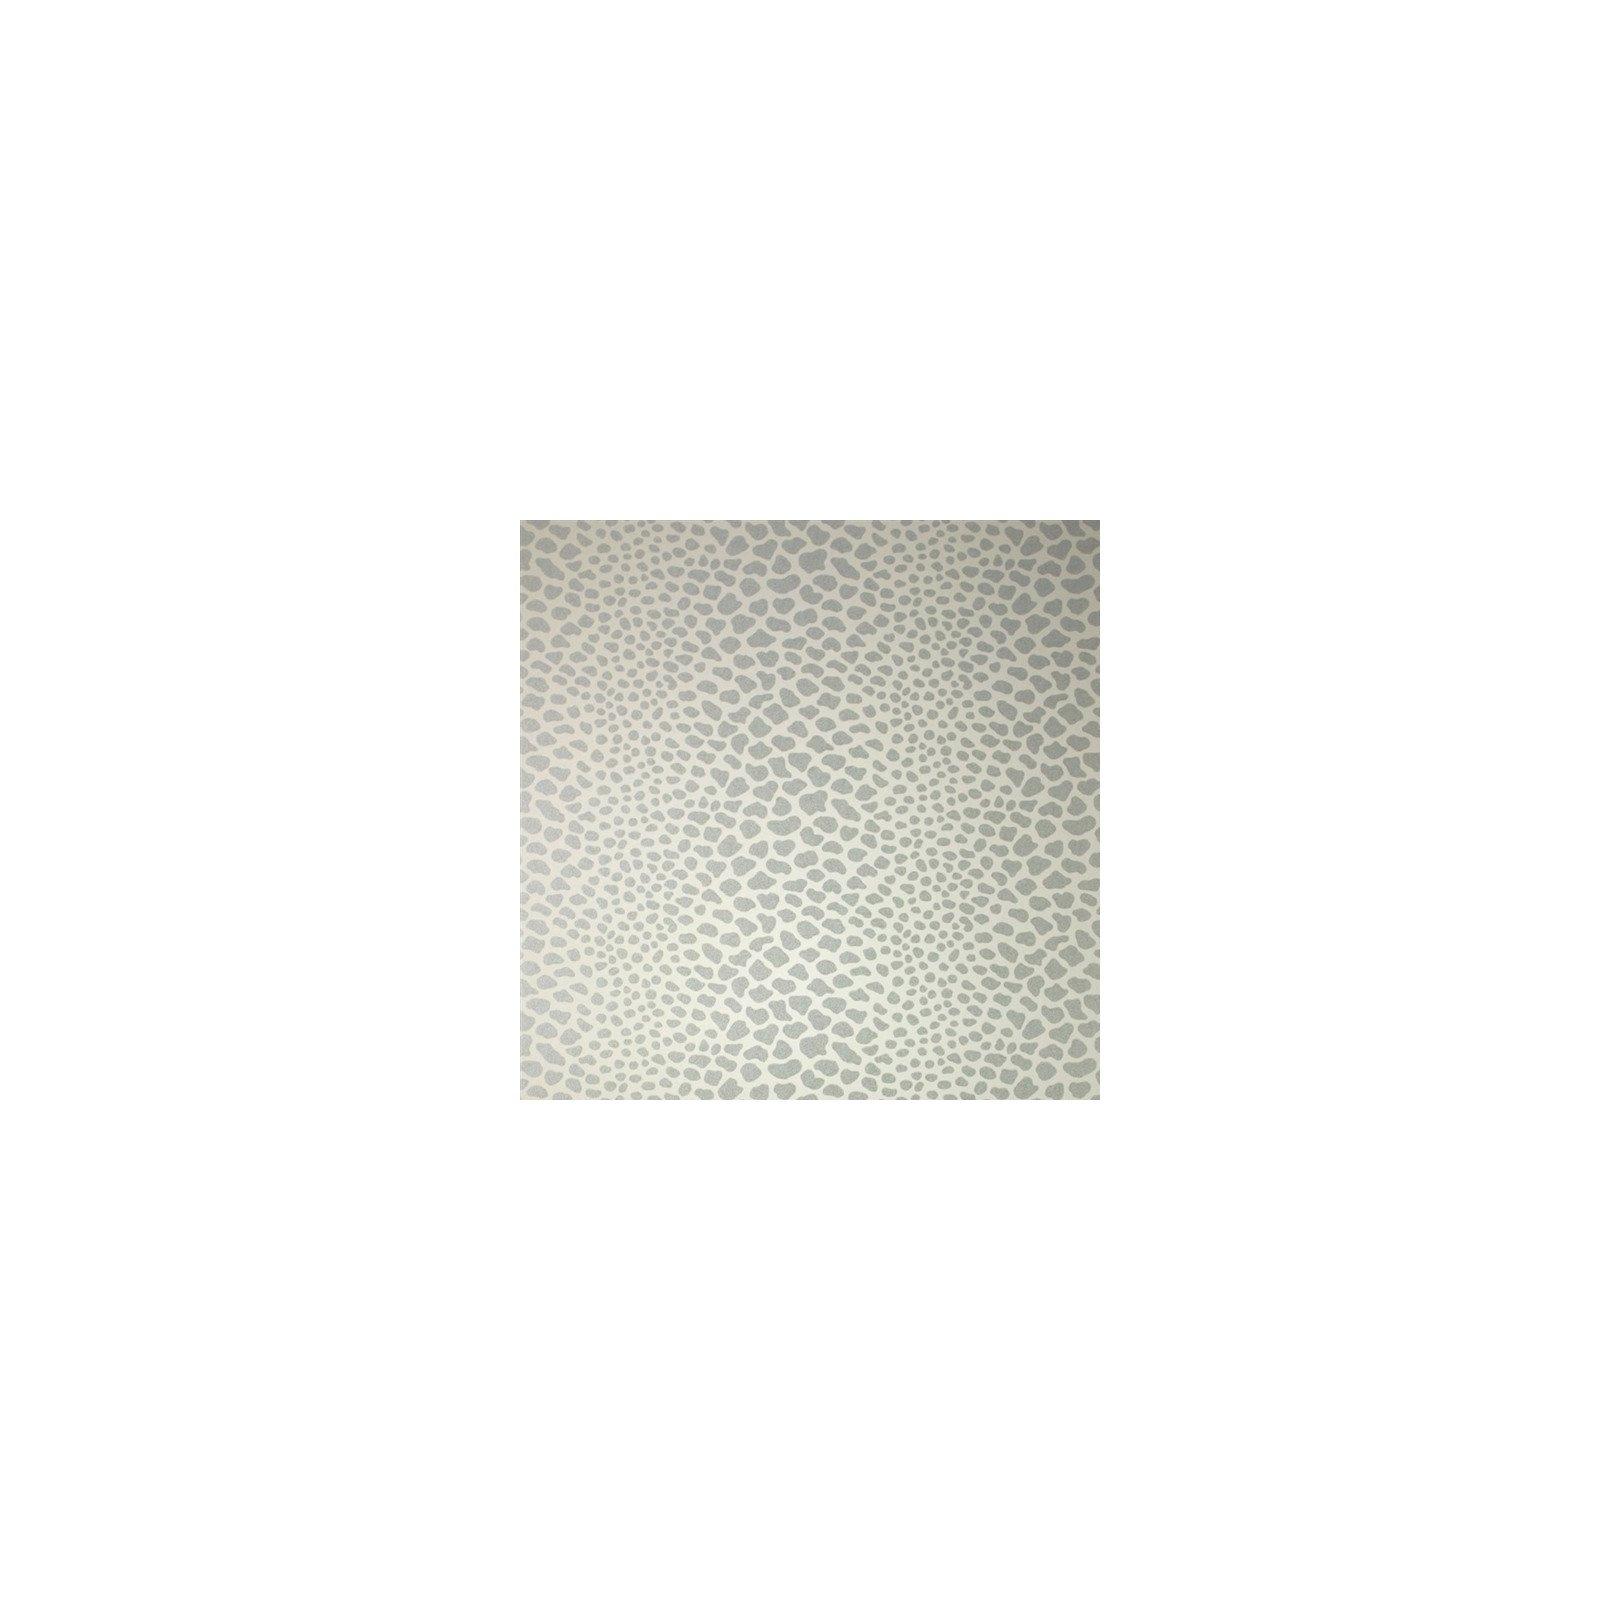 Papier peint - Osborne & Little - Panthera - Pale linen/Silver